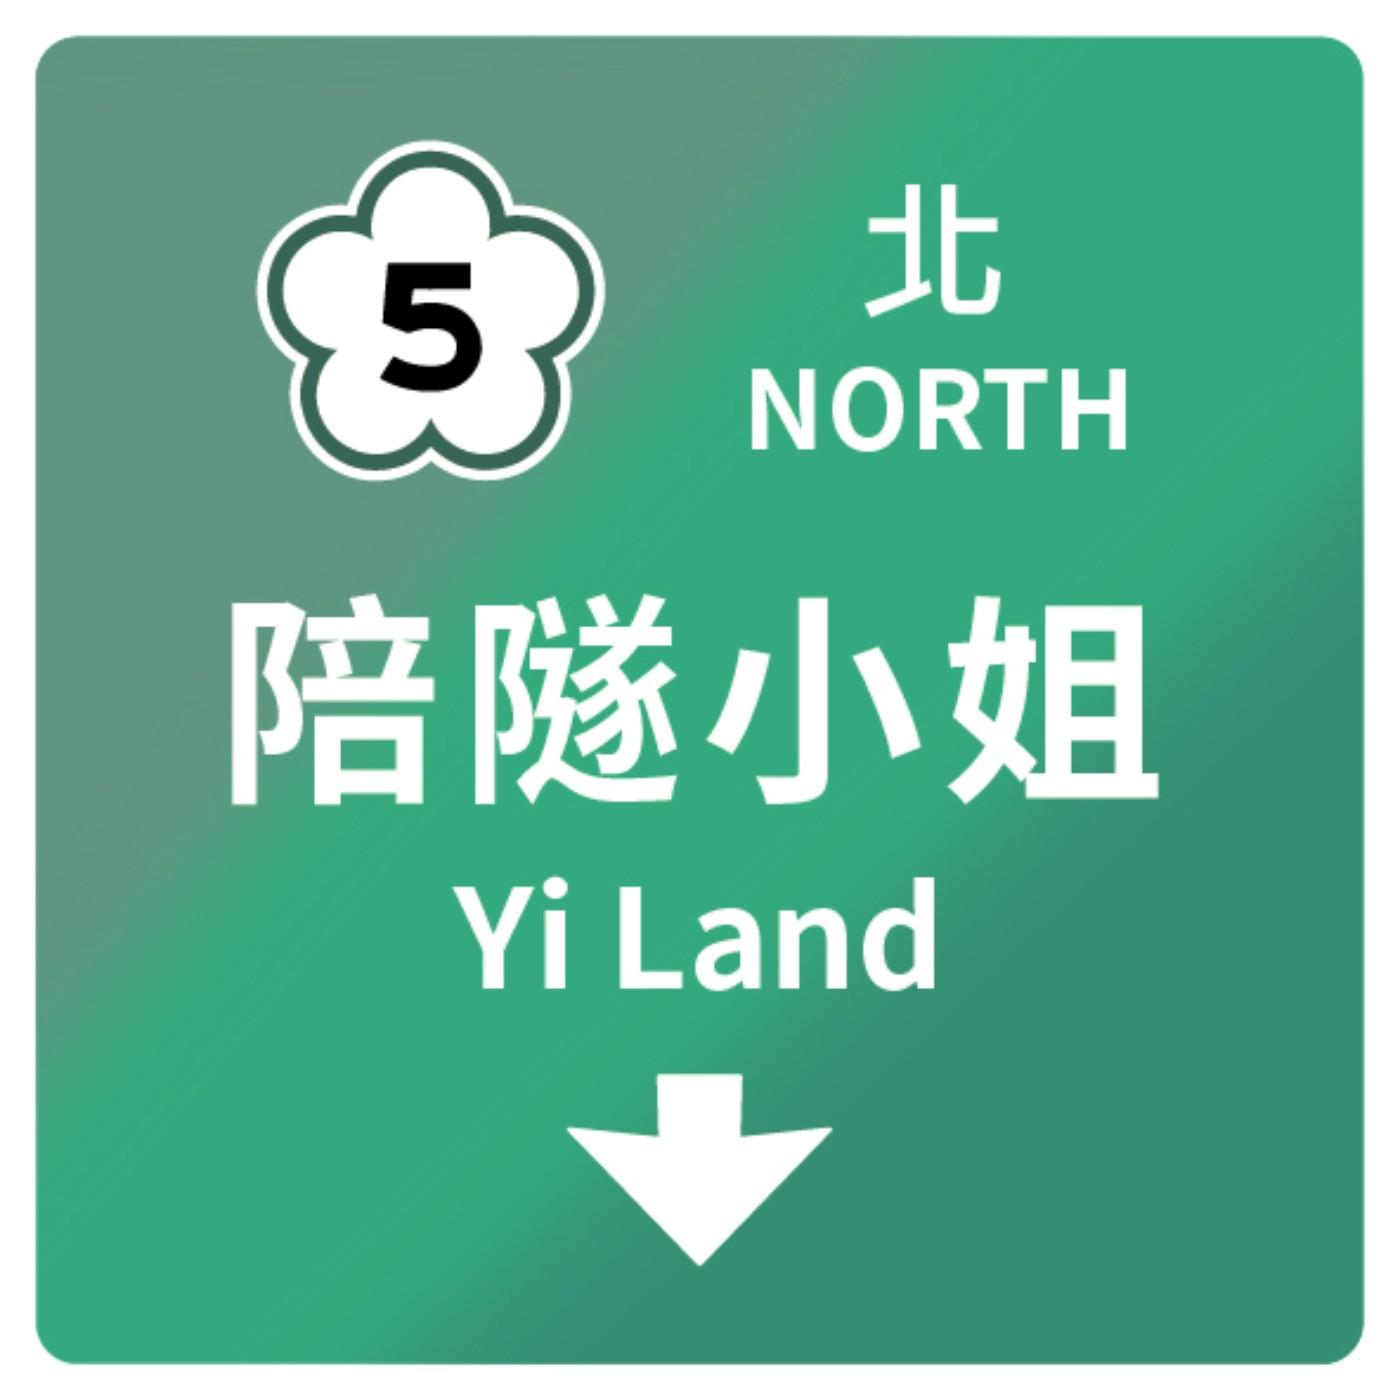 Ep.29【有人陪隧】德佬別以為台灣小女子好欺負ft. 薛呈祥